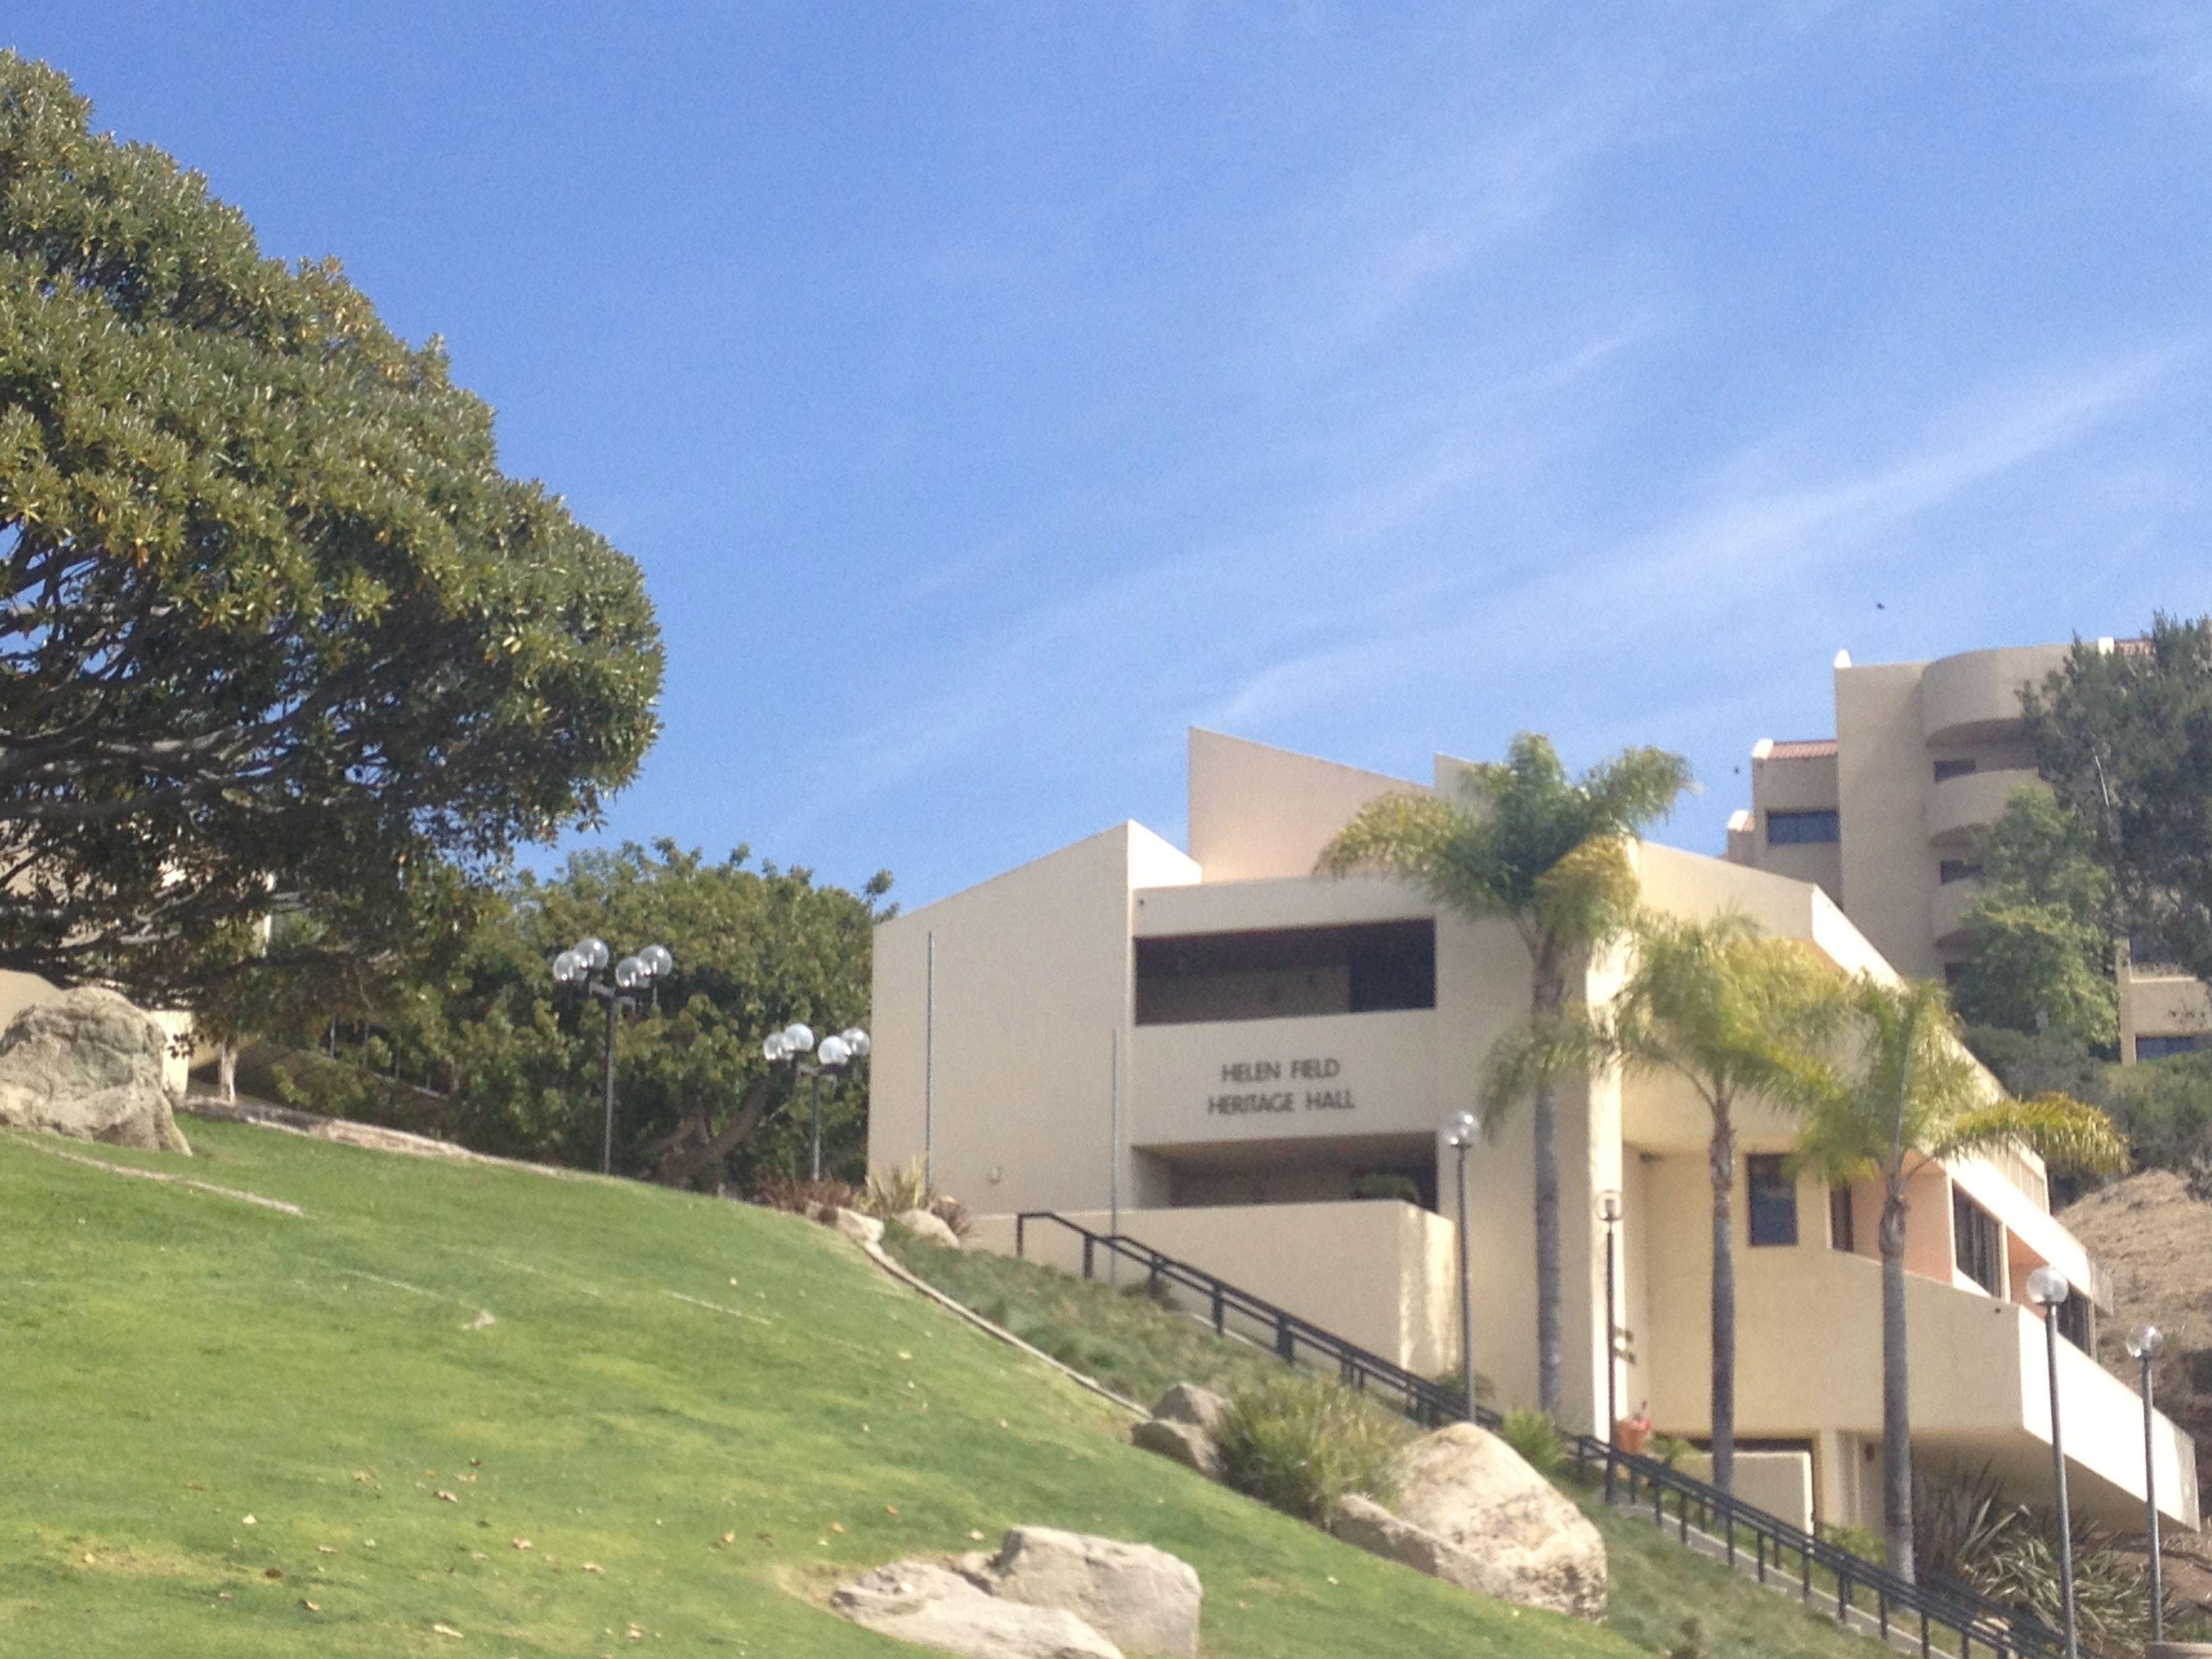 Chances Of Getting Into Pepperdine University?